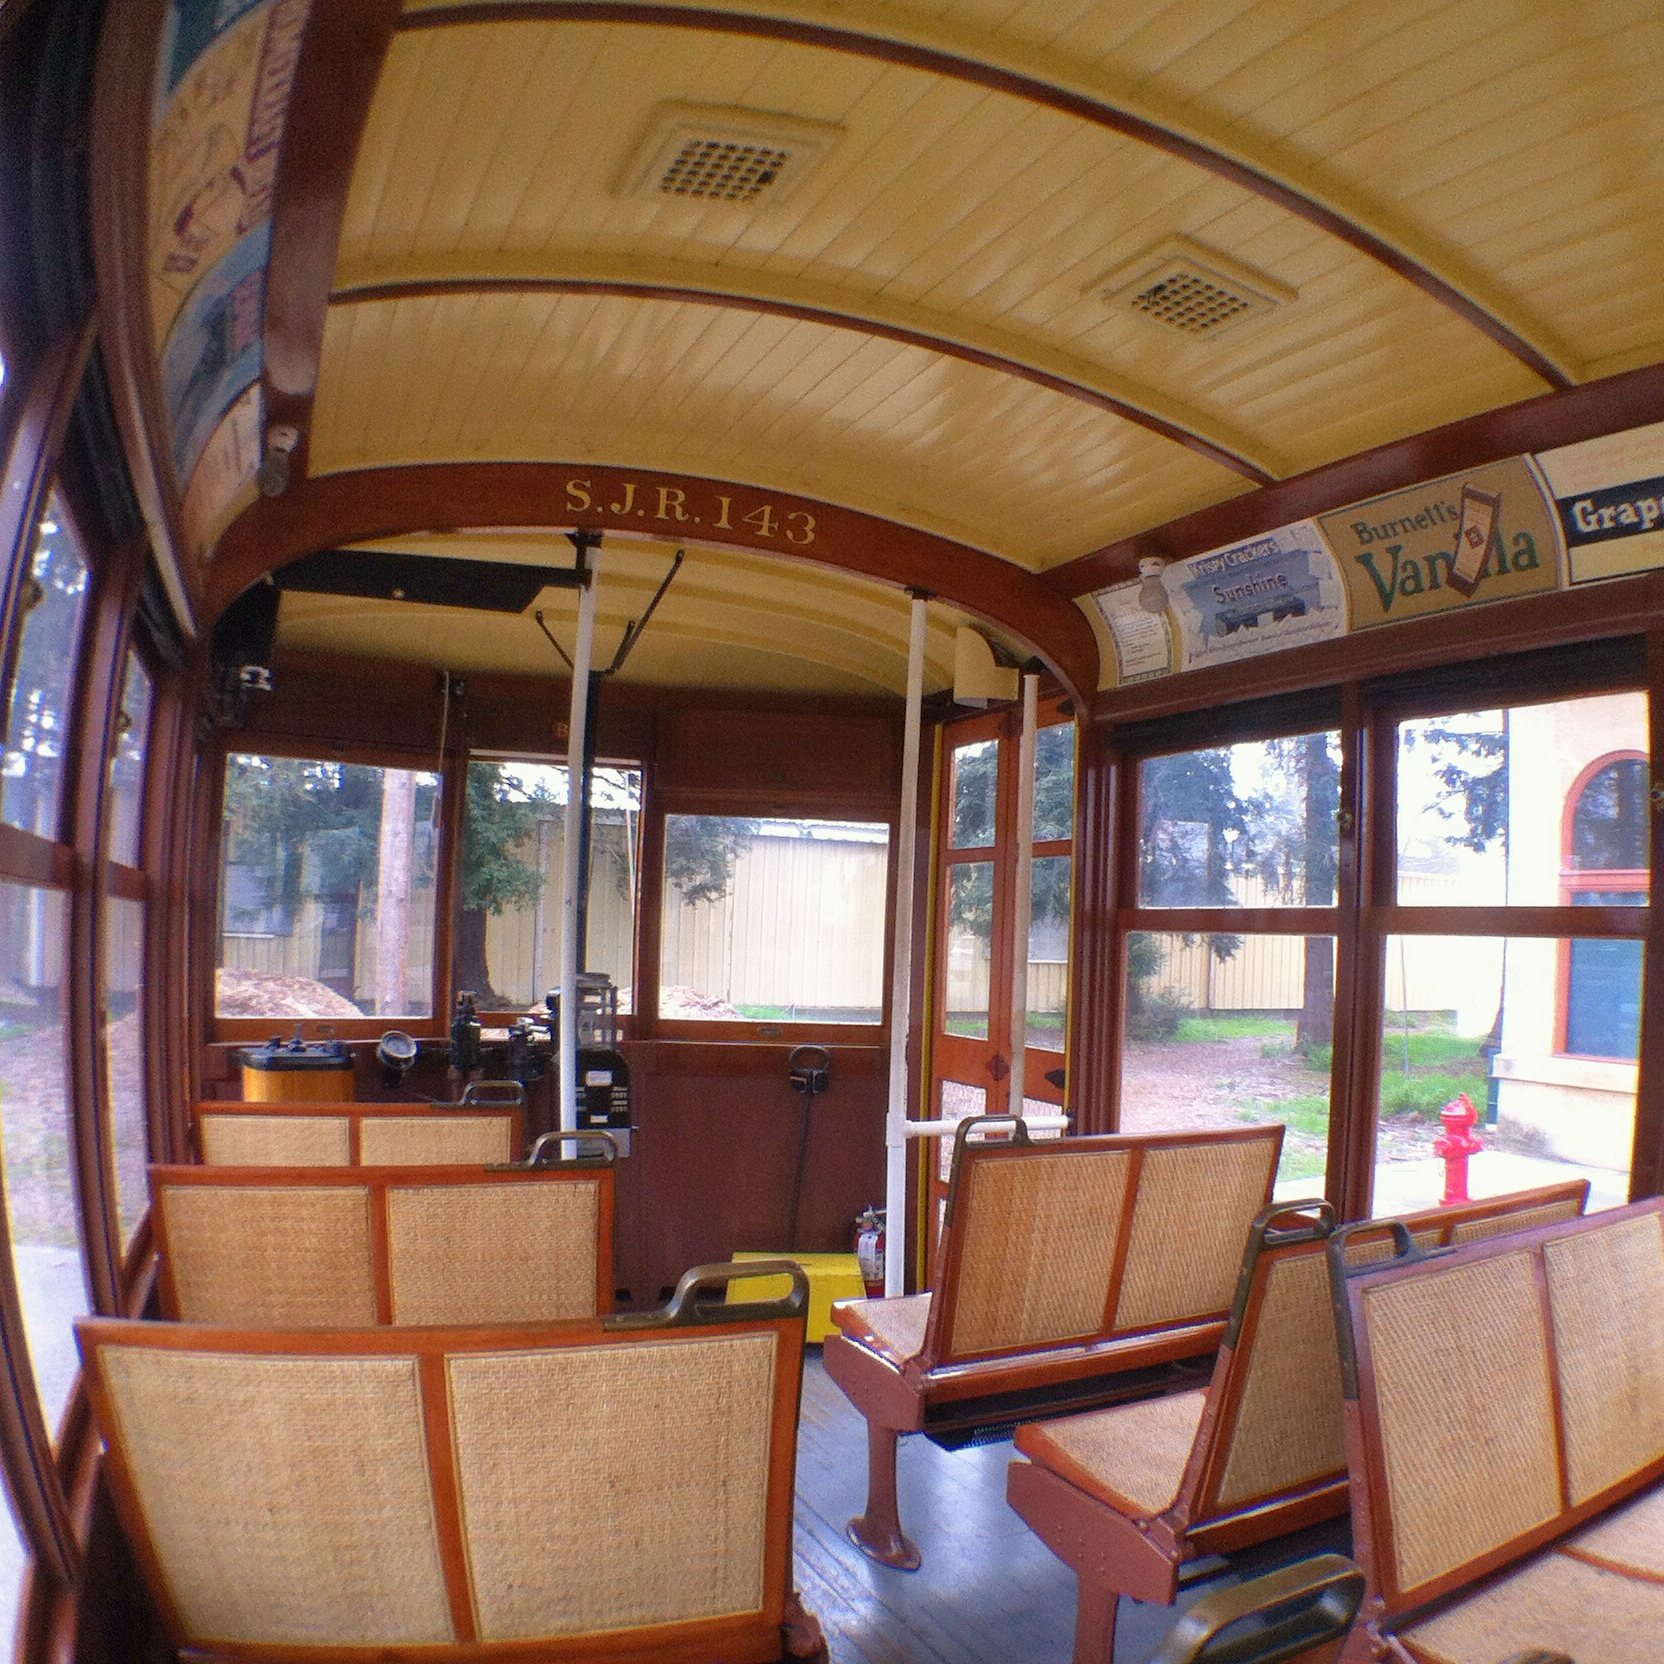 HistorySJ_trolleySeats2.jpg